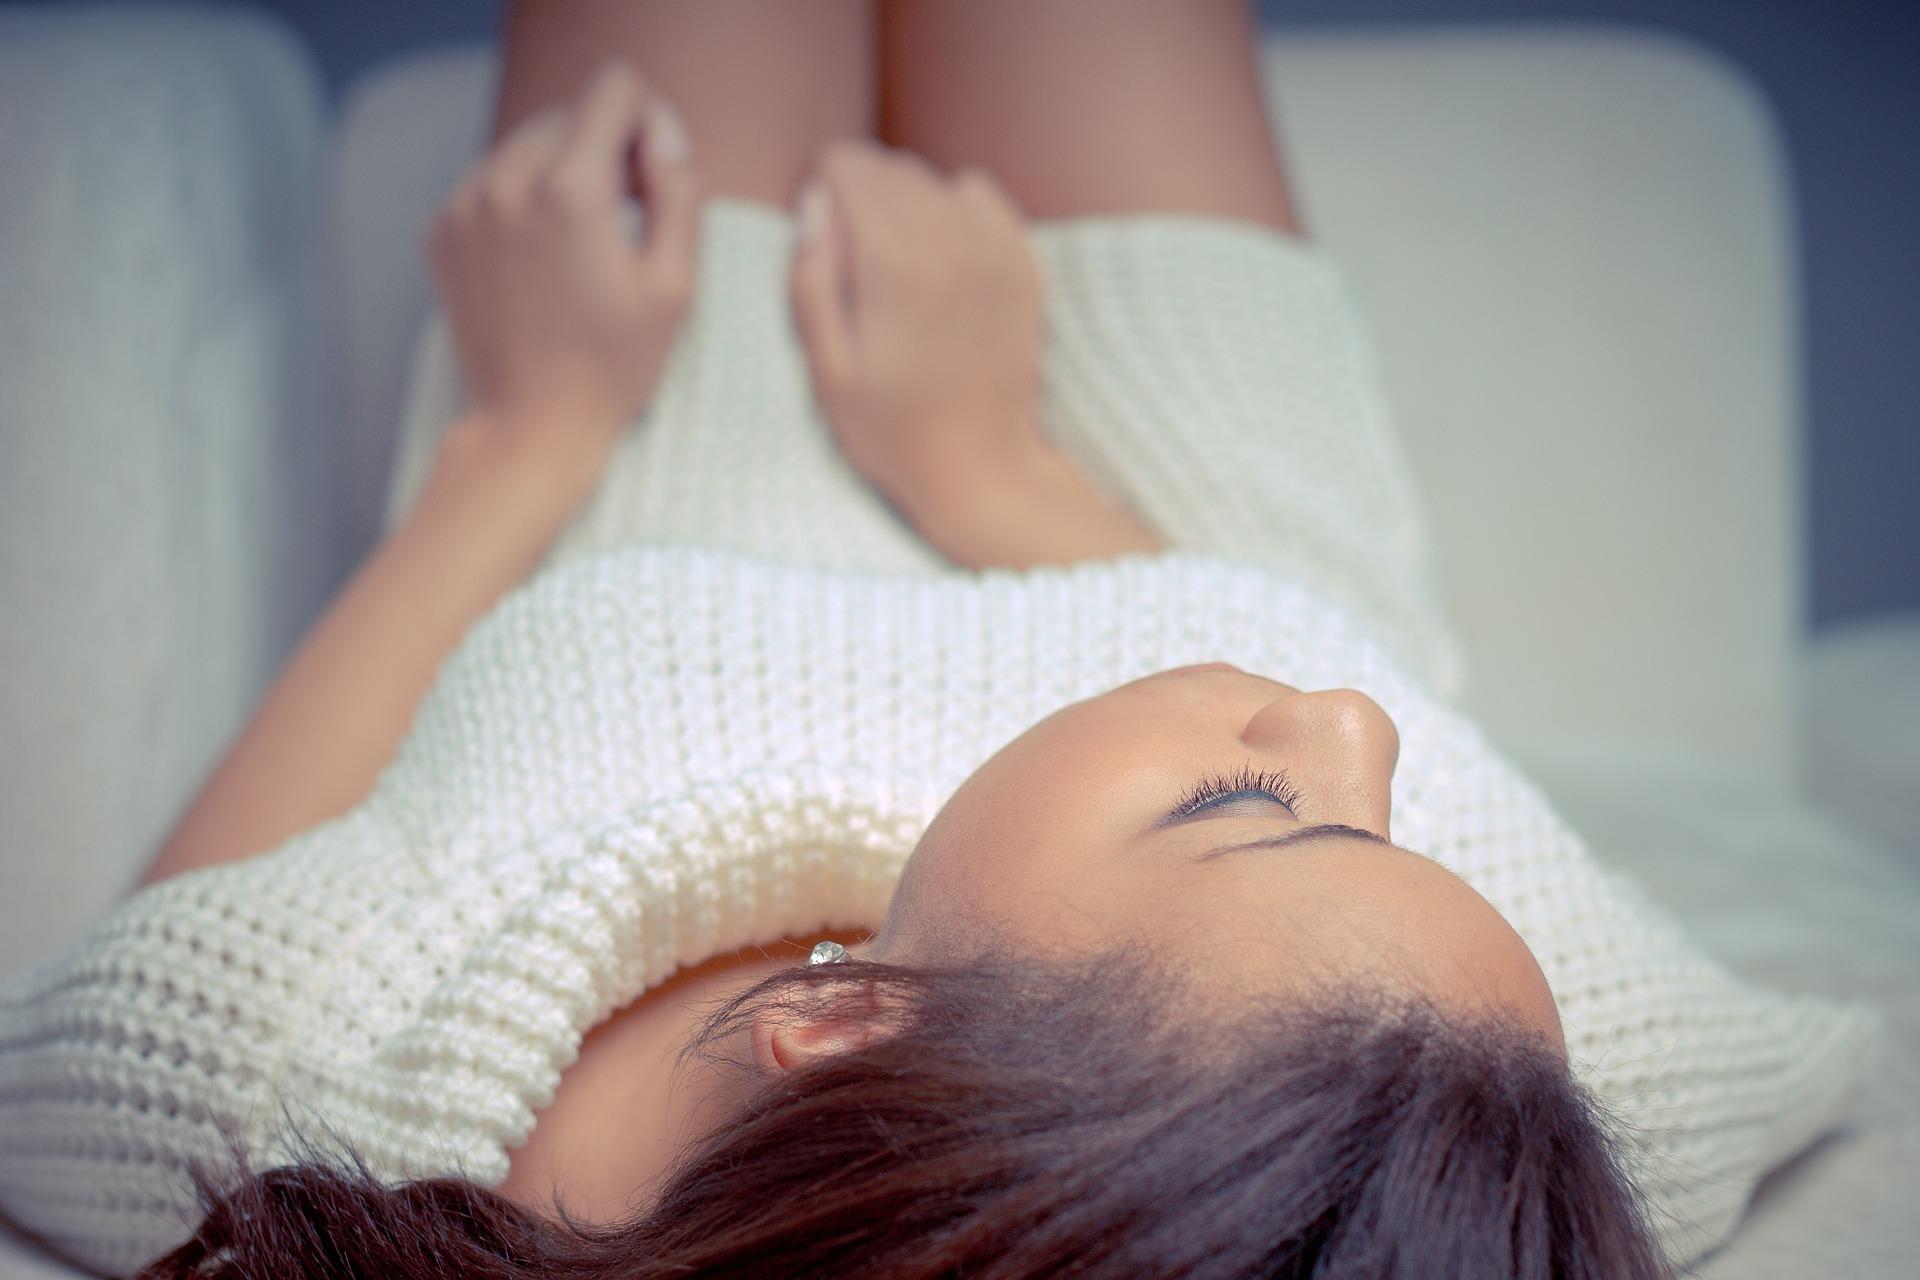 Amenorrea primaria: cause, sintomi e cure